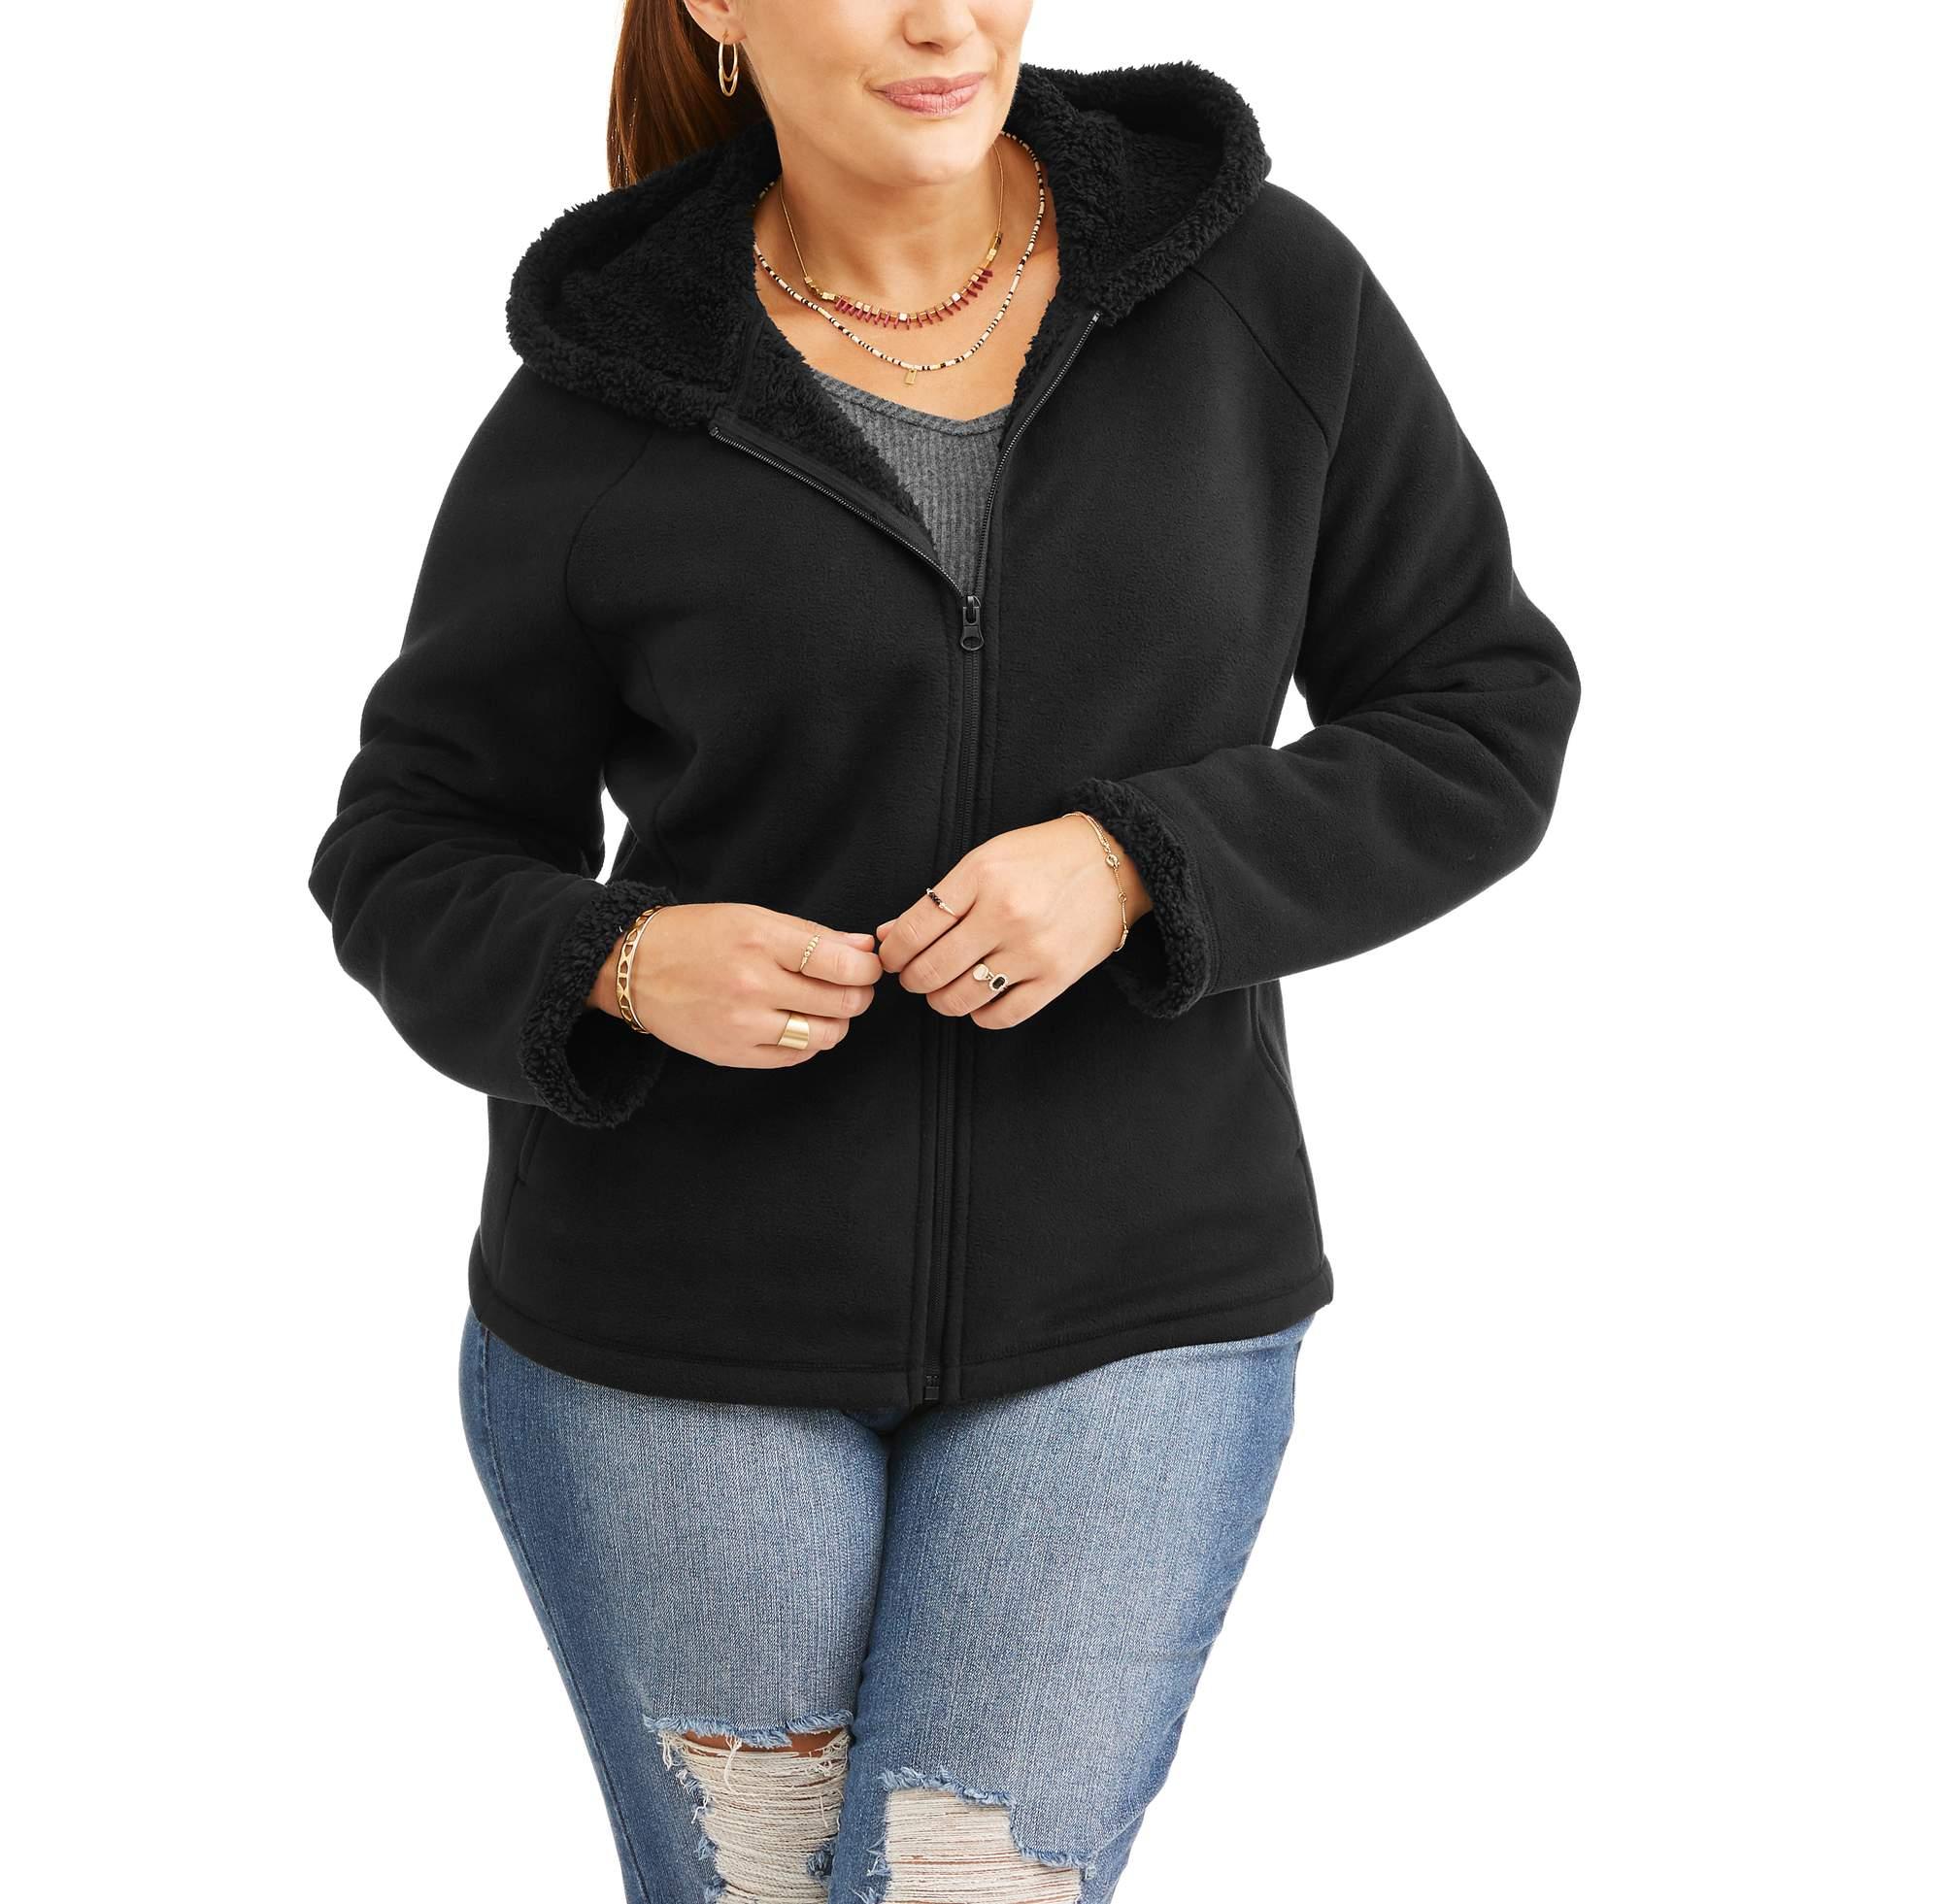 40984956c02c Faded Glory - Faded Glory Women s Plus-Size Microfleece Hoodie With ...